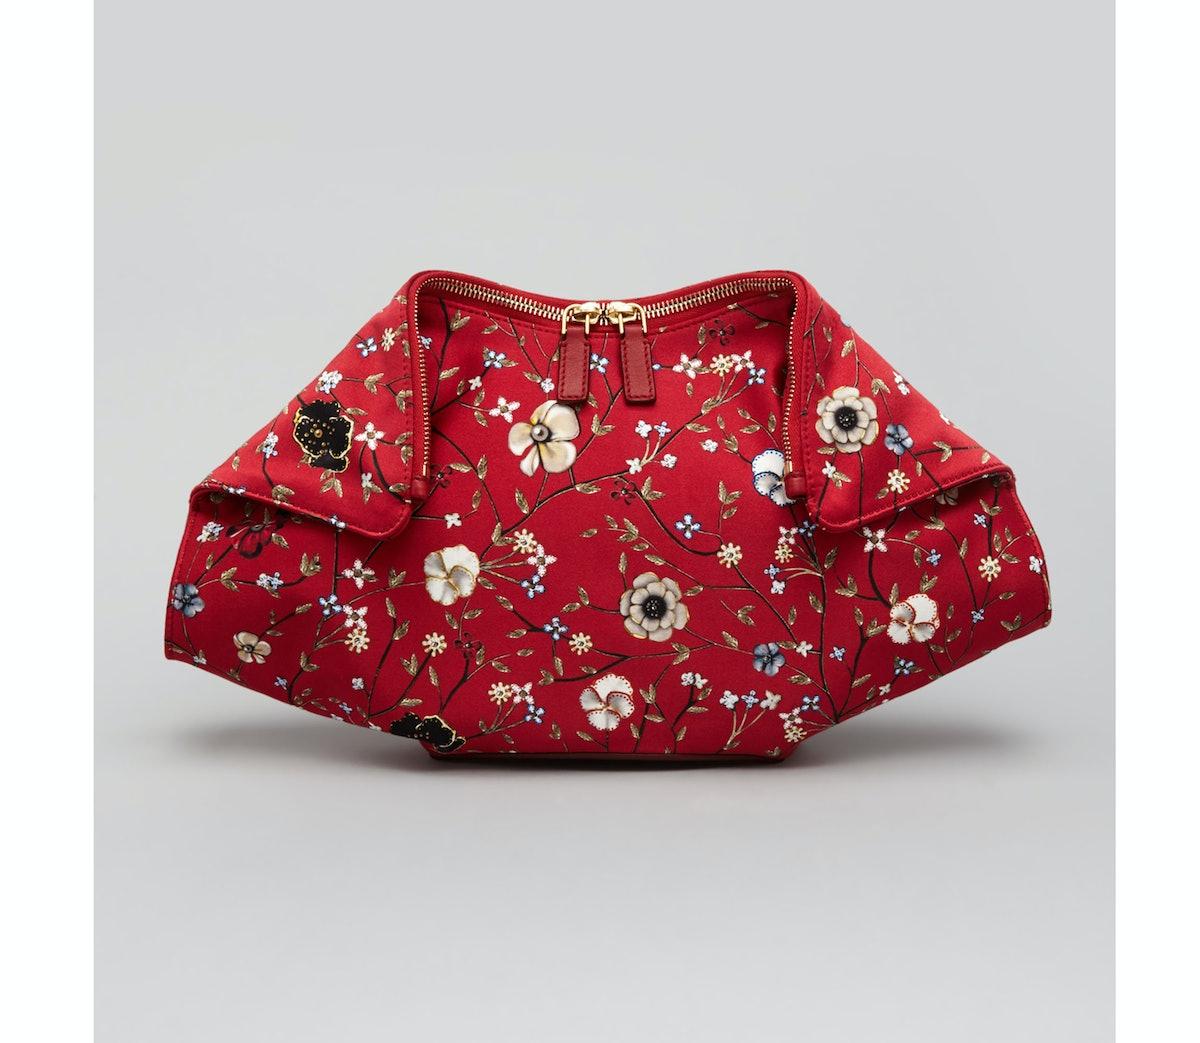 eccentric-handbags-fall-2013-01